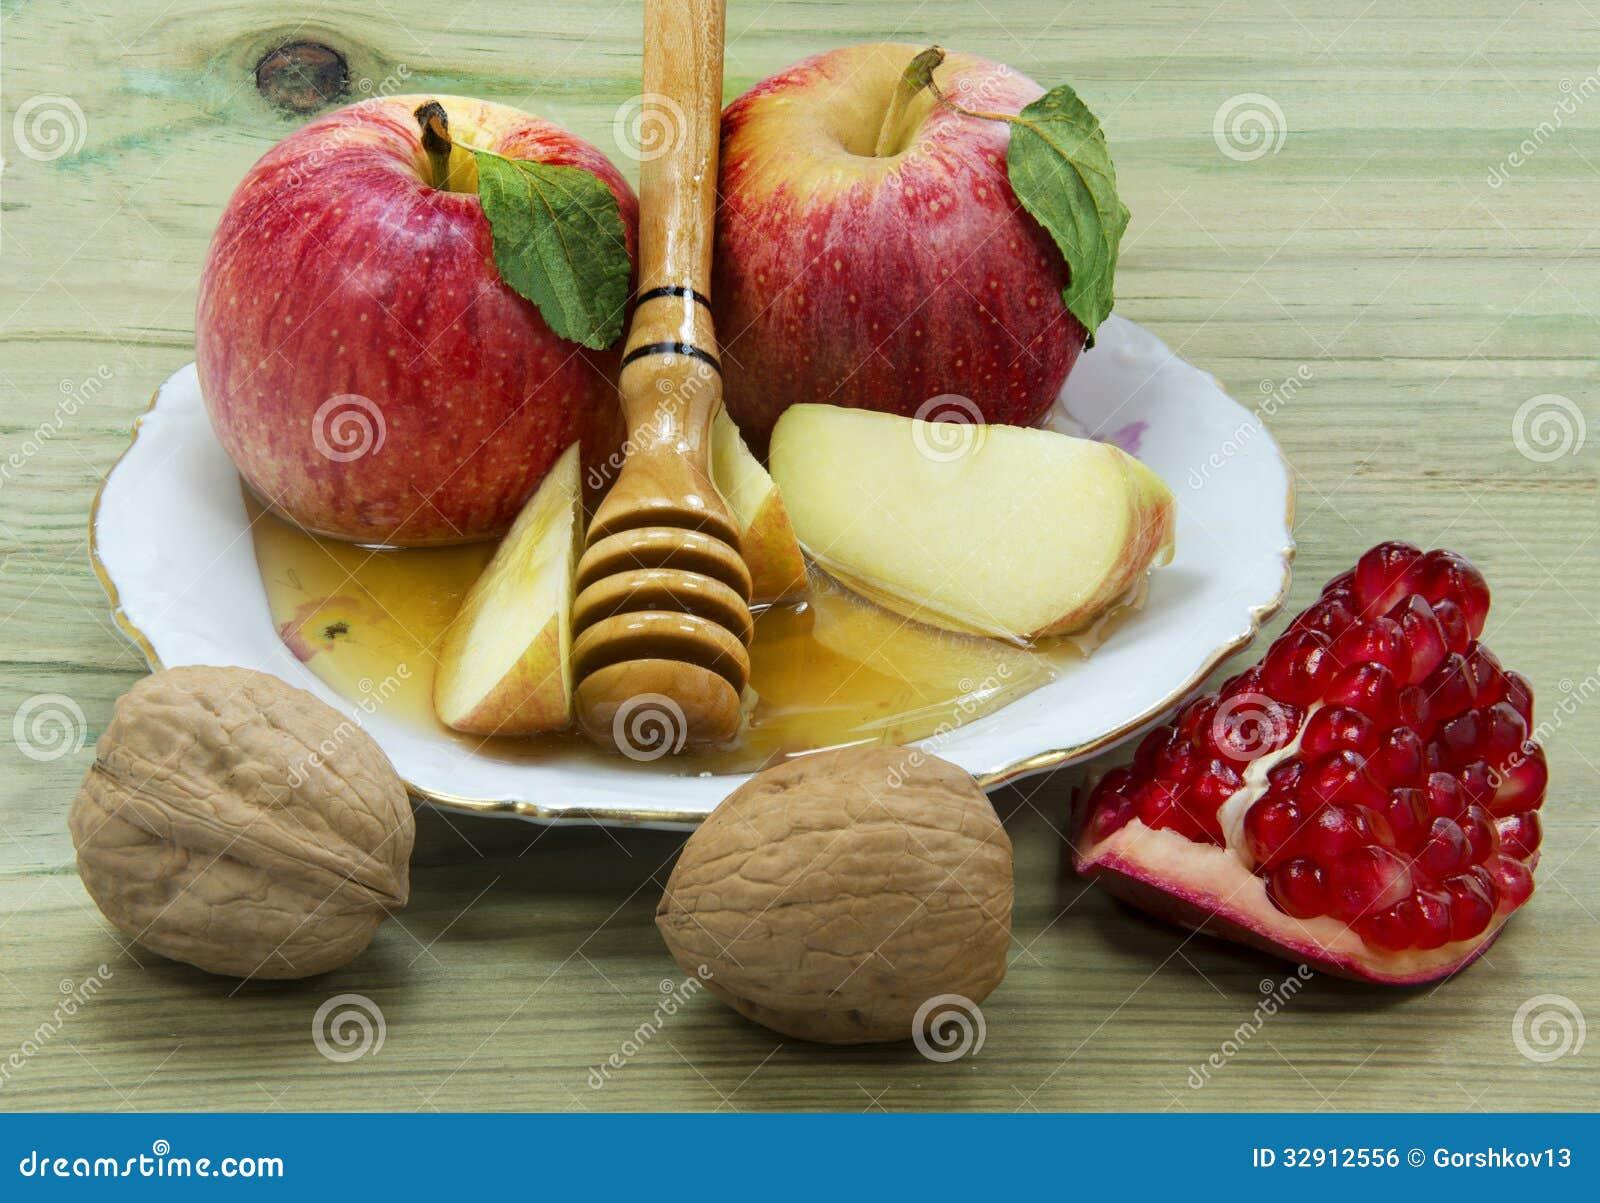 Traditional food for rosh hashanah stock photo image of apple traditional food for rosh hashanah biocorpaavc